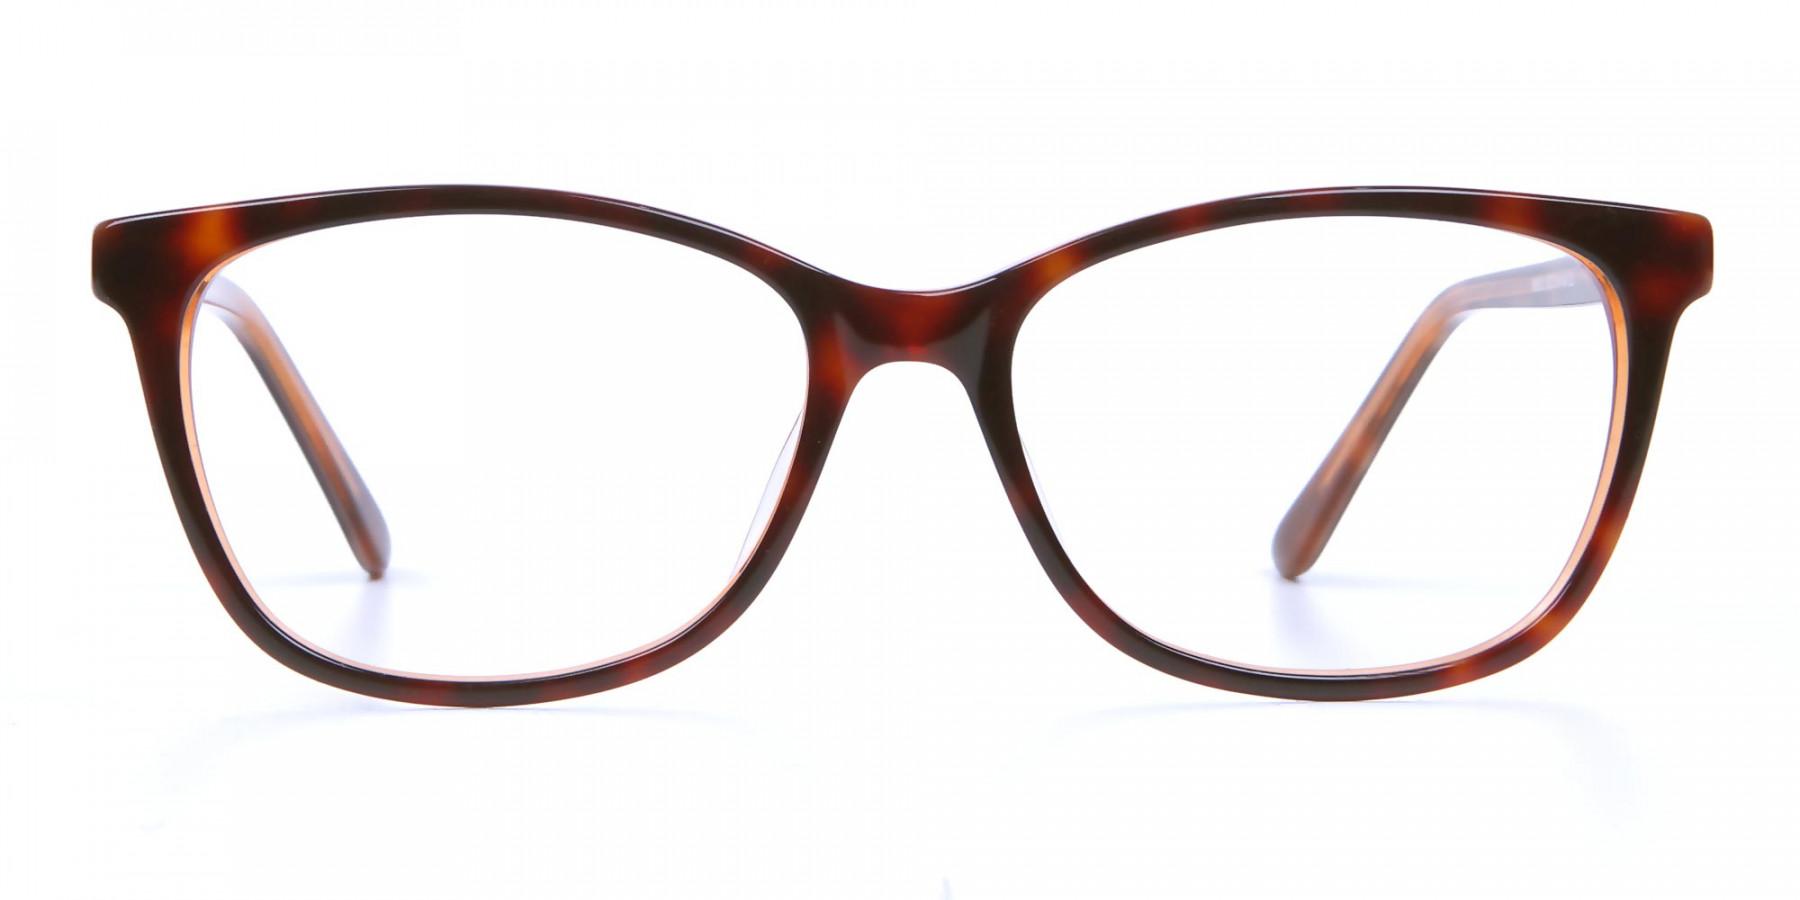 Maple Tortoiseshell Glasses with Diamante